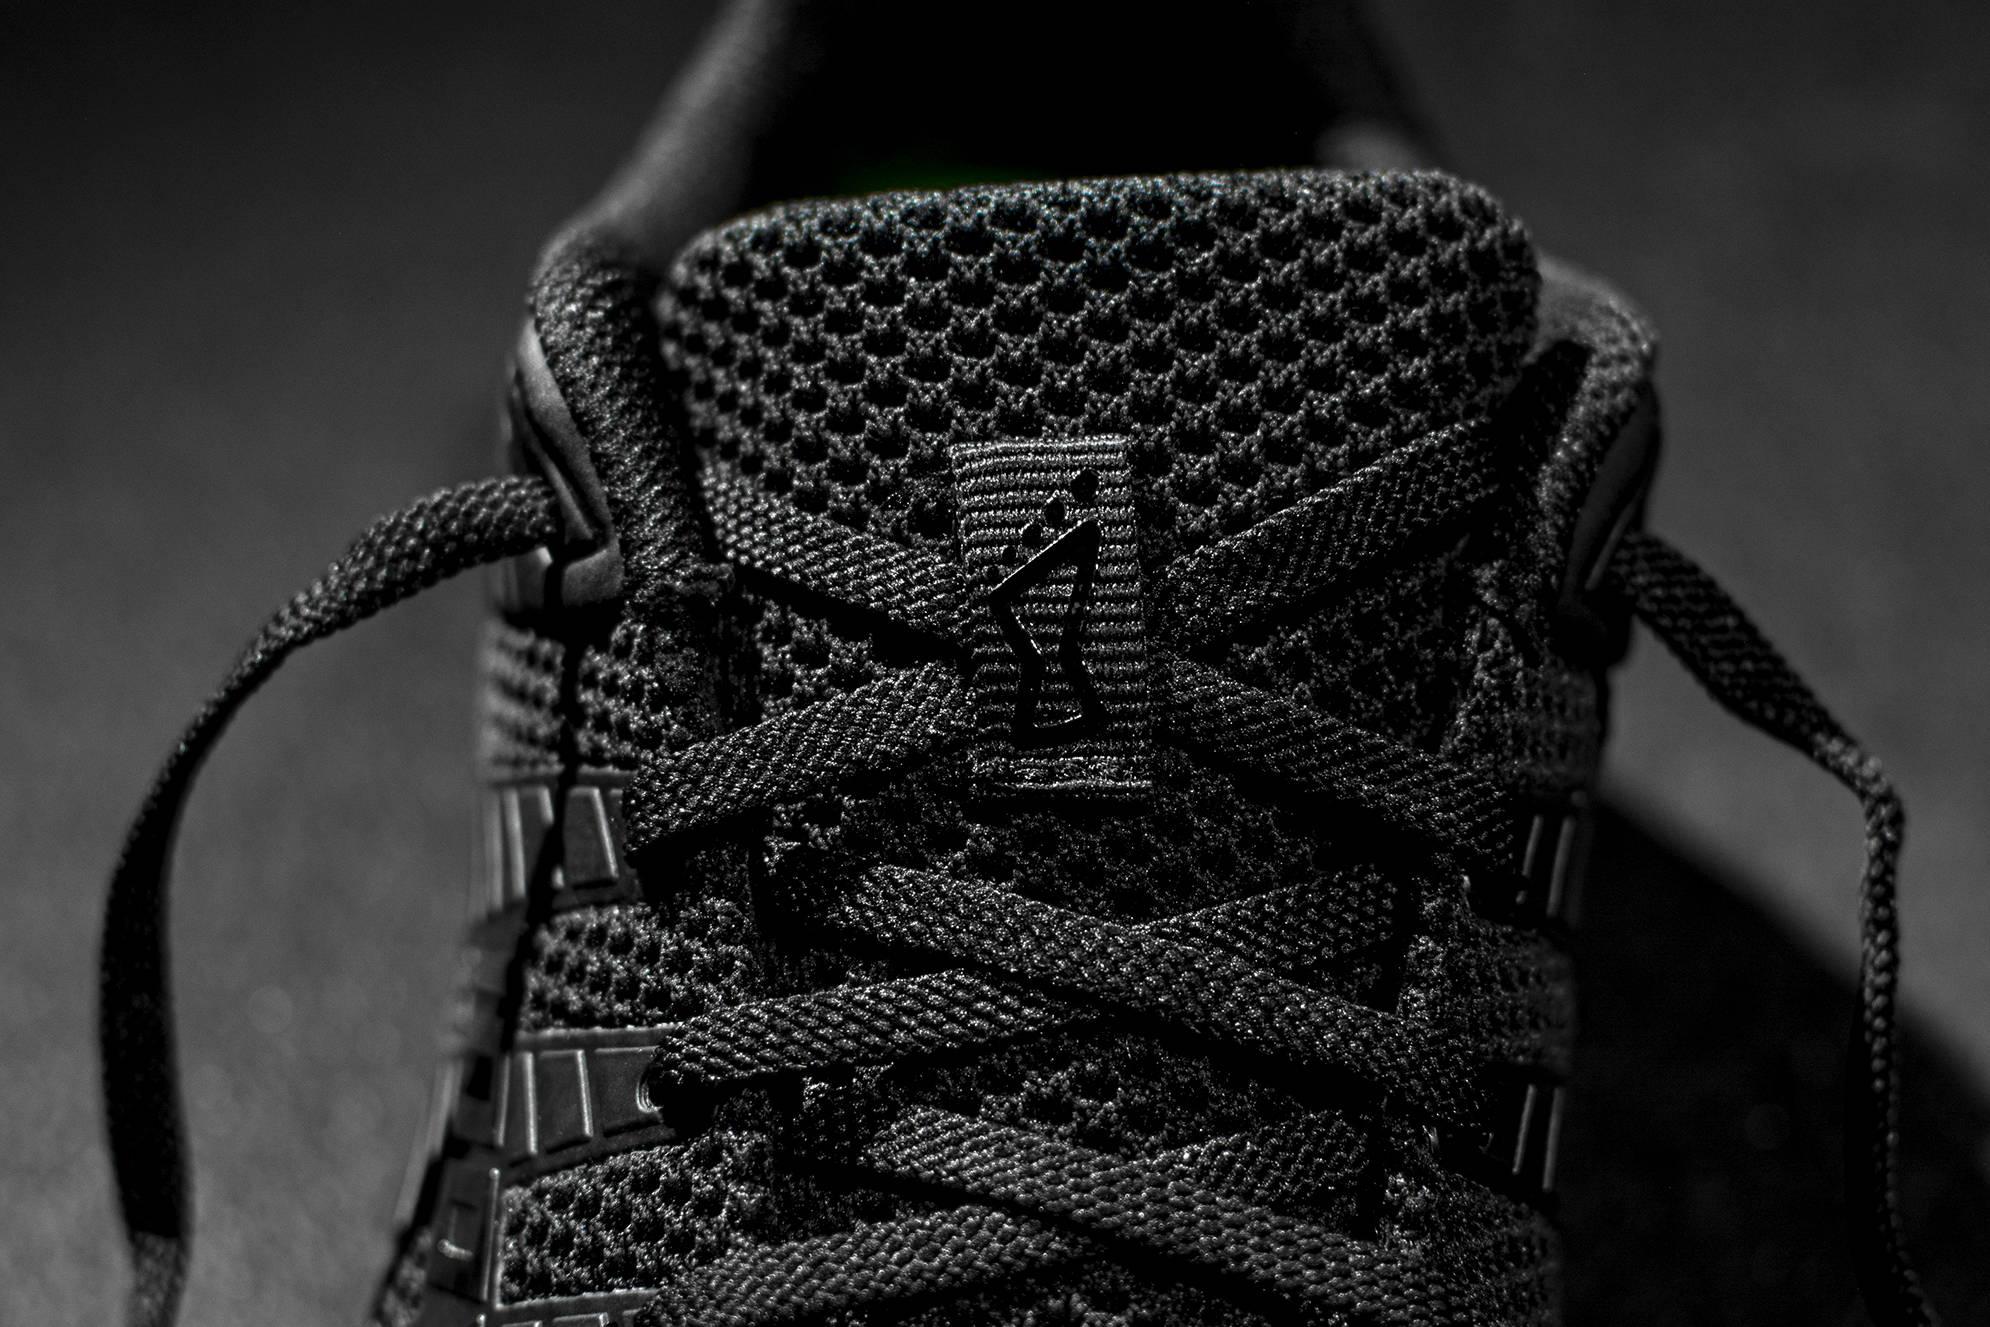 inov-8 F-Lite 260 knit shoe closeup